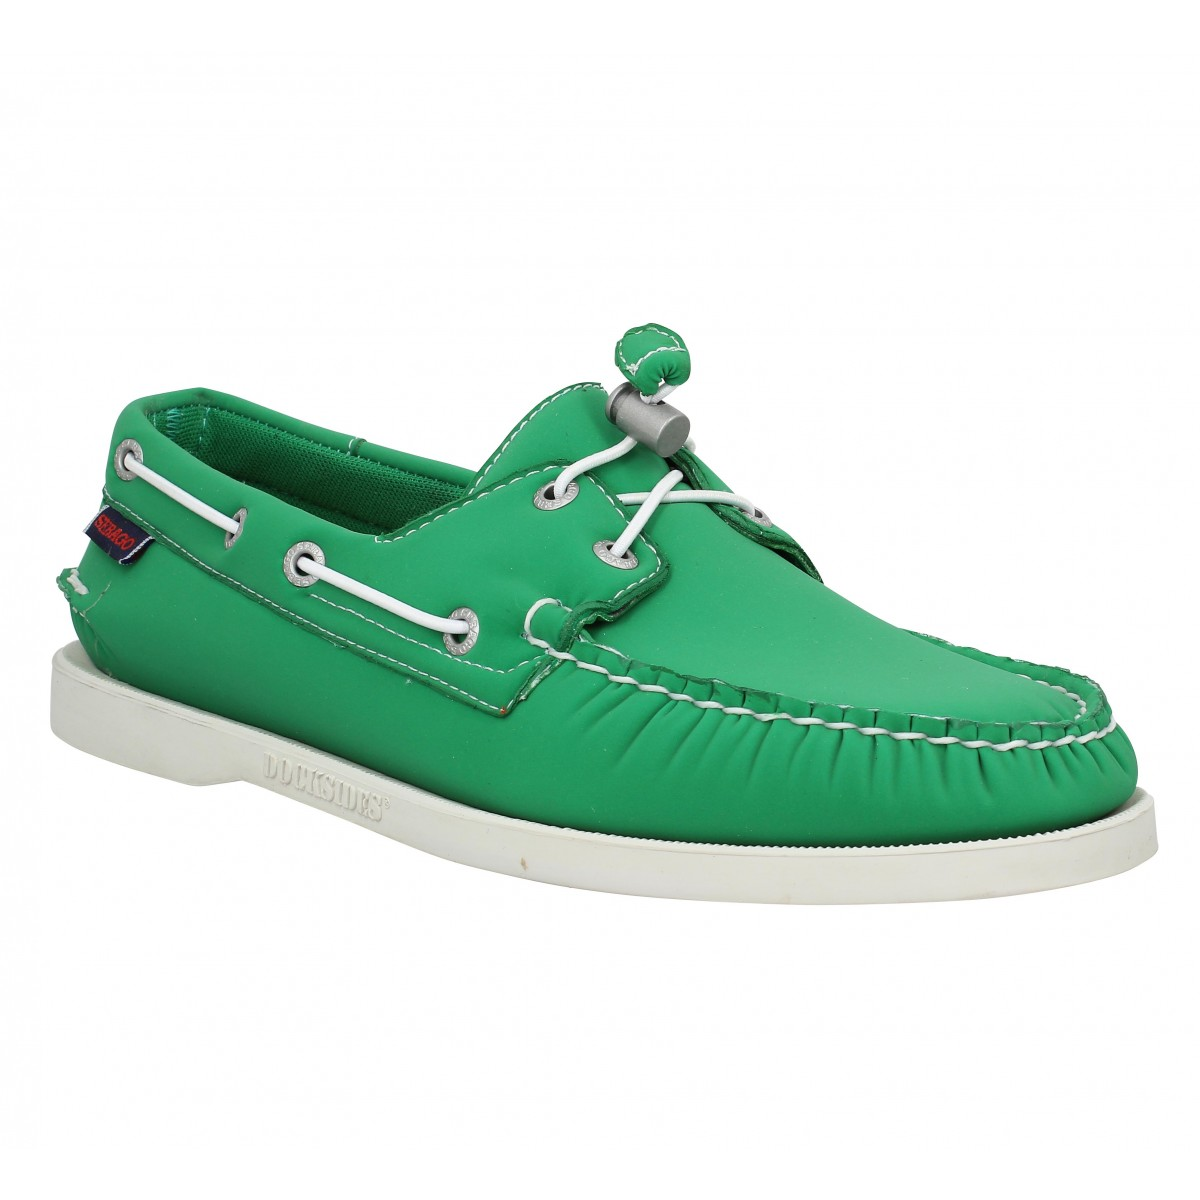 Chaussures bateaux SEBAGO Docksides neoprene Homme Vert